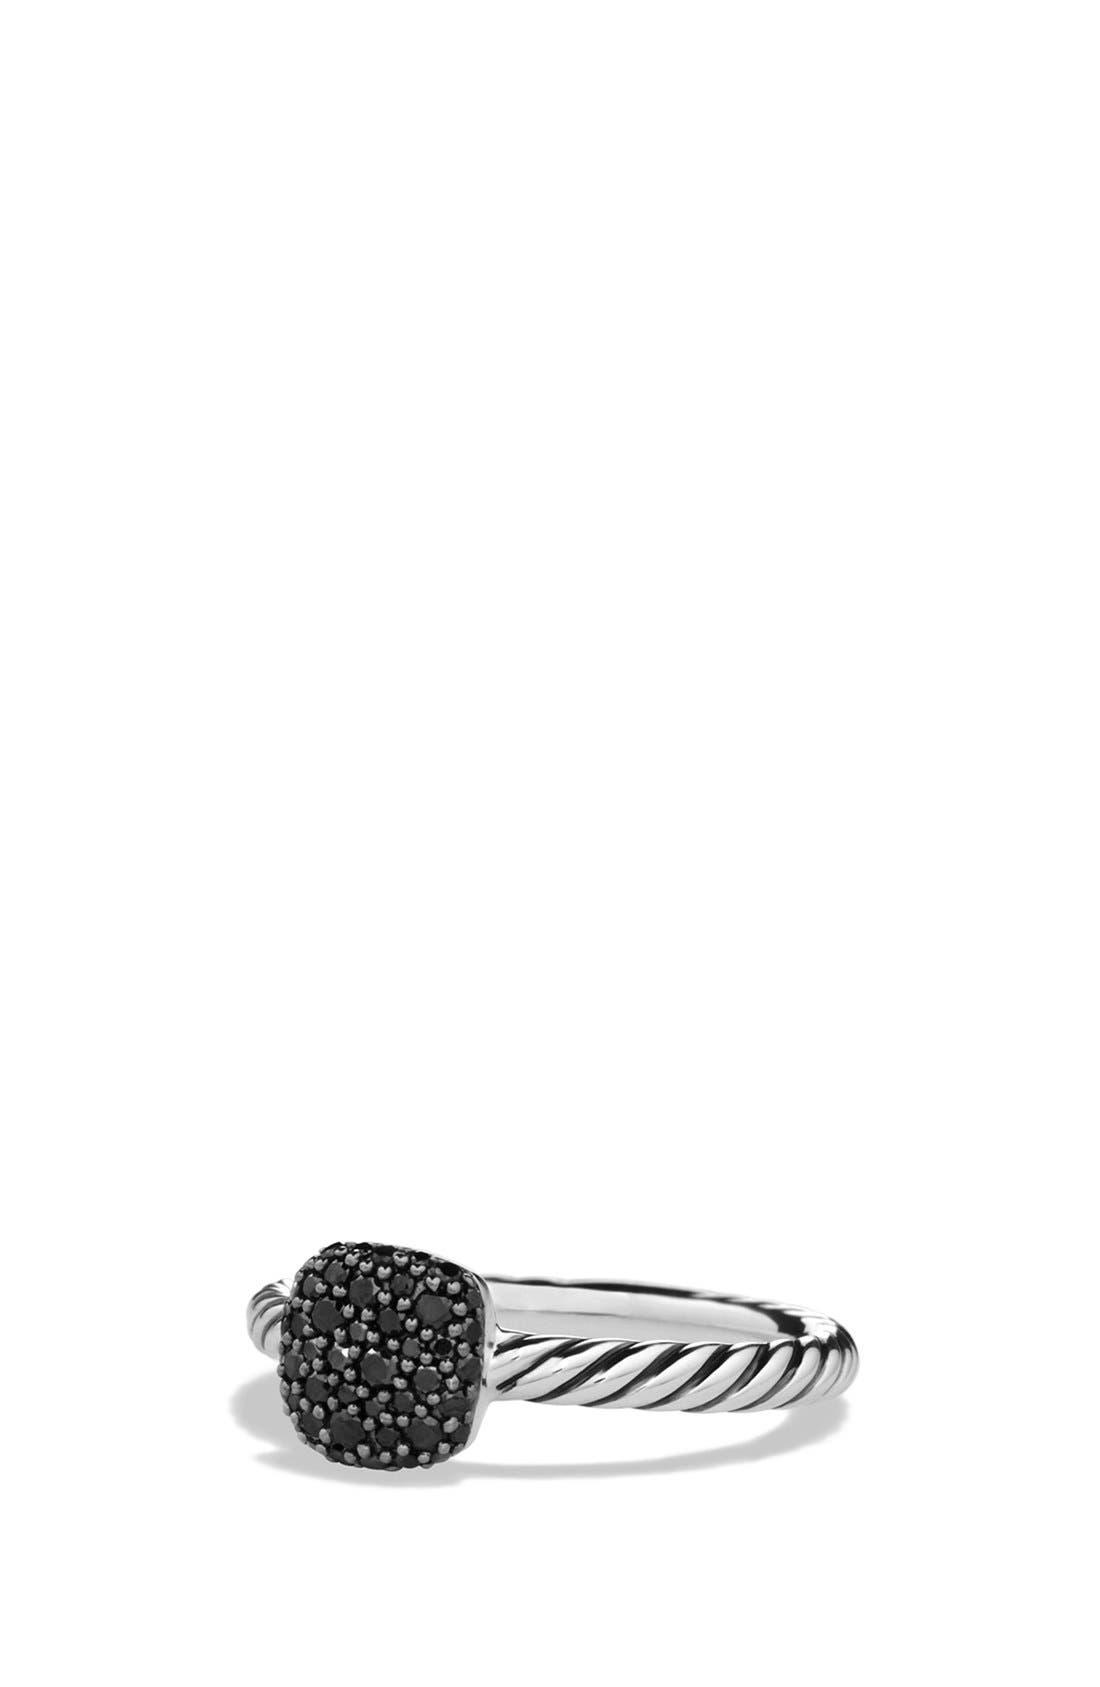 DAVID YURMAN 'Pavé' Cushion Ring with Black Diamonds